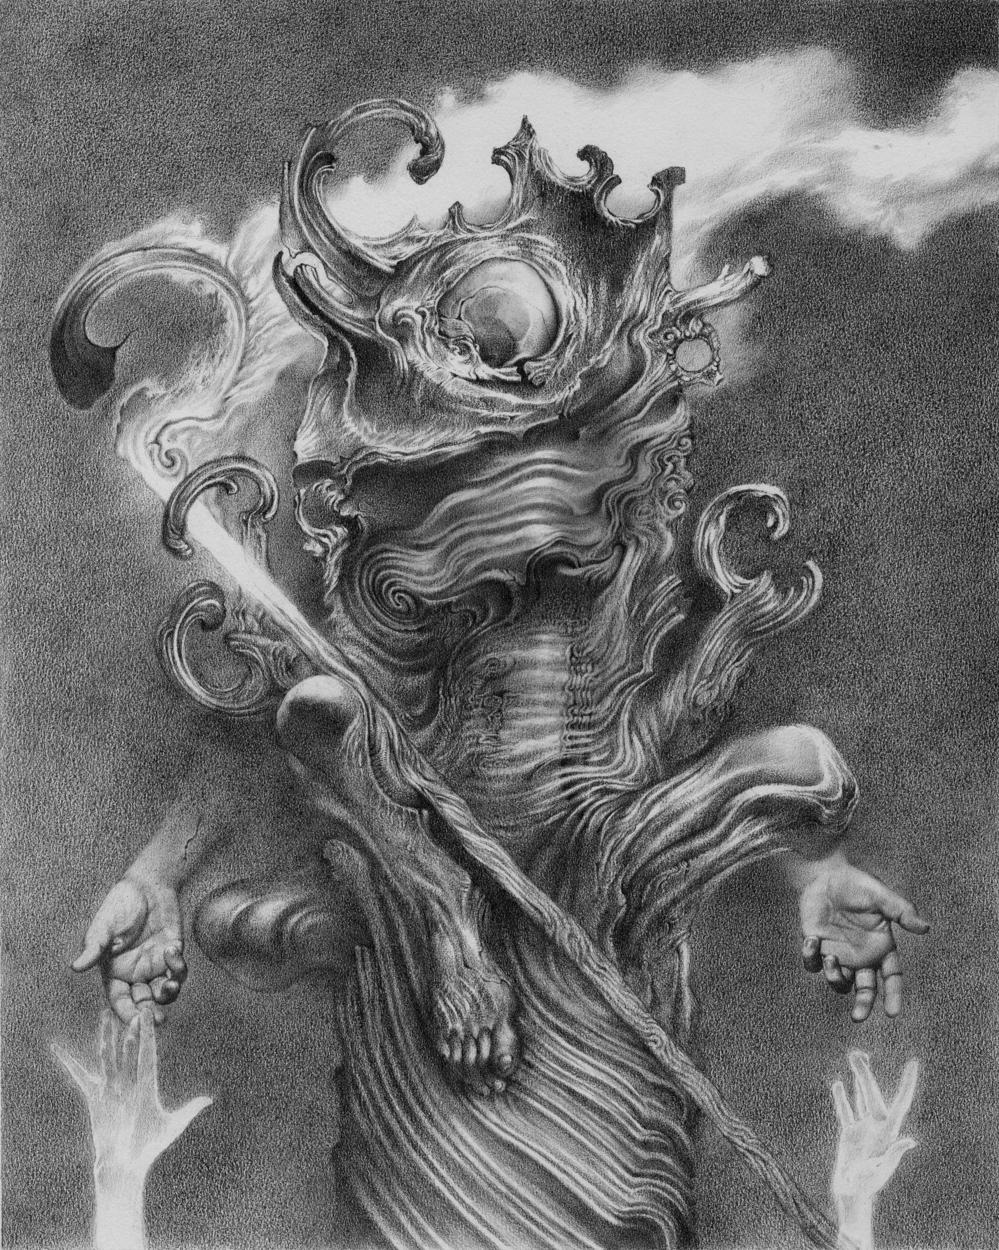 The Crookt Man Artwork by Allen Williams